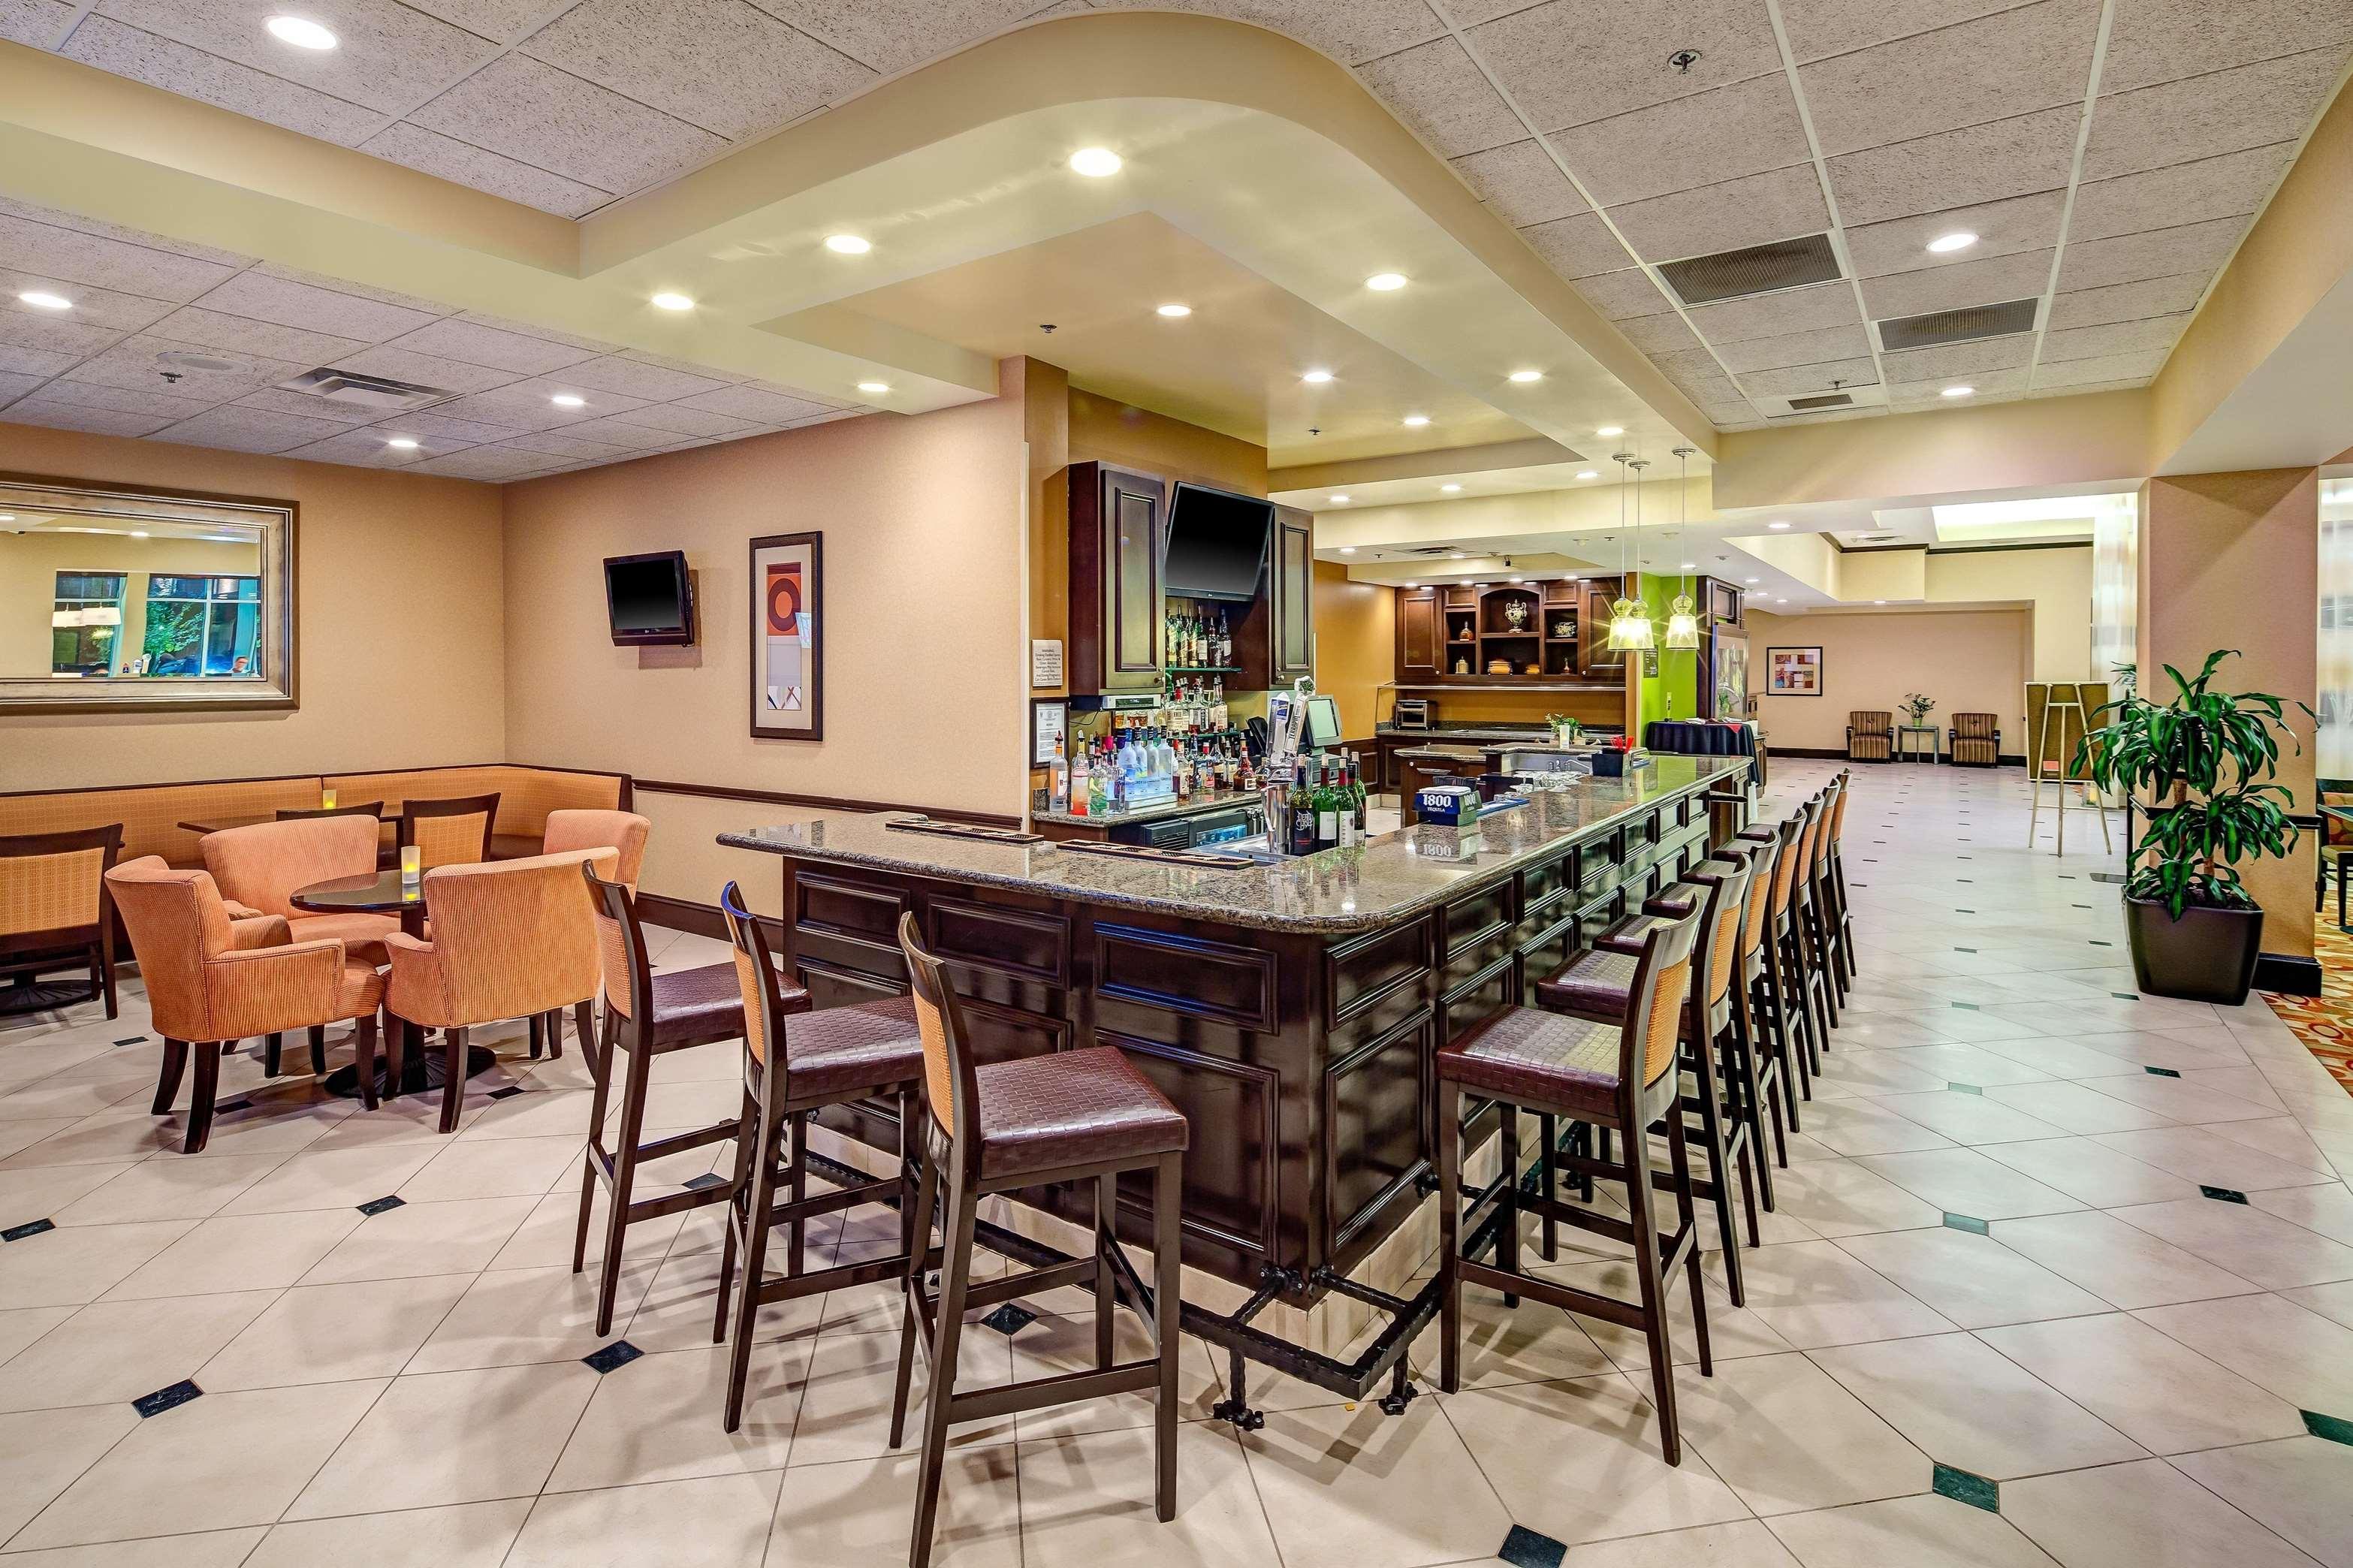 Superior Hilton Garden Inn Augusta 1065 Stevens Creek Road Augusta, GA Hotels U0026  Motels   MapQuest Photo